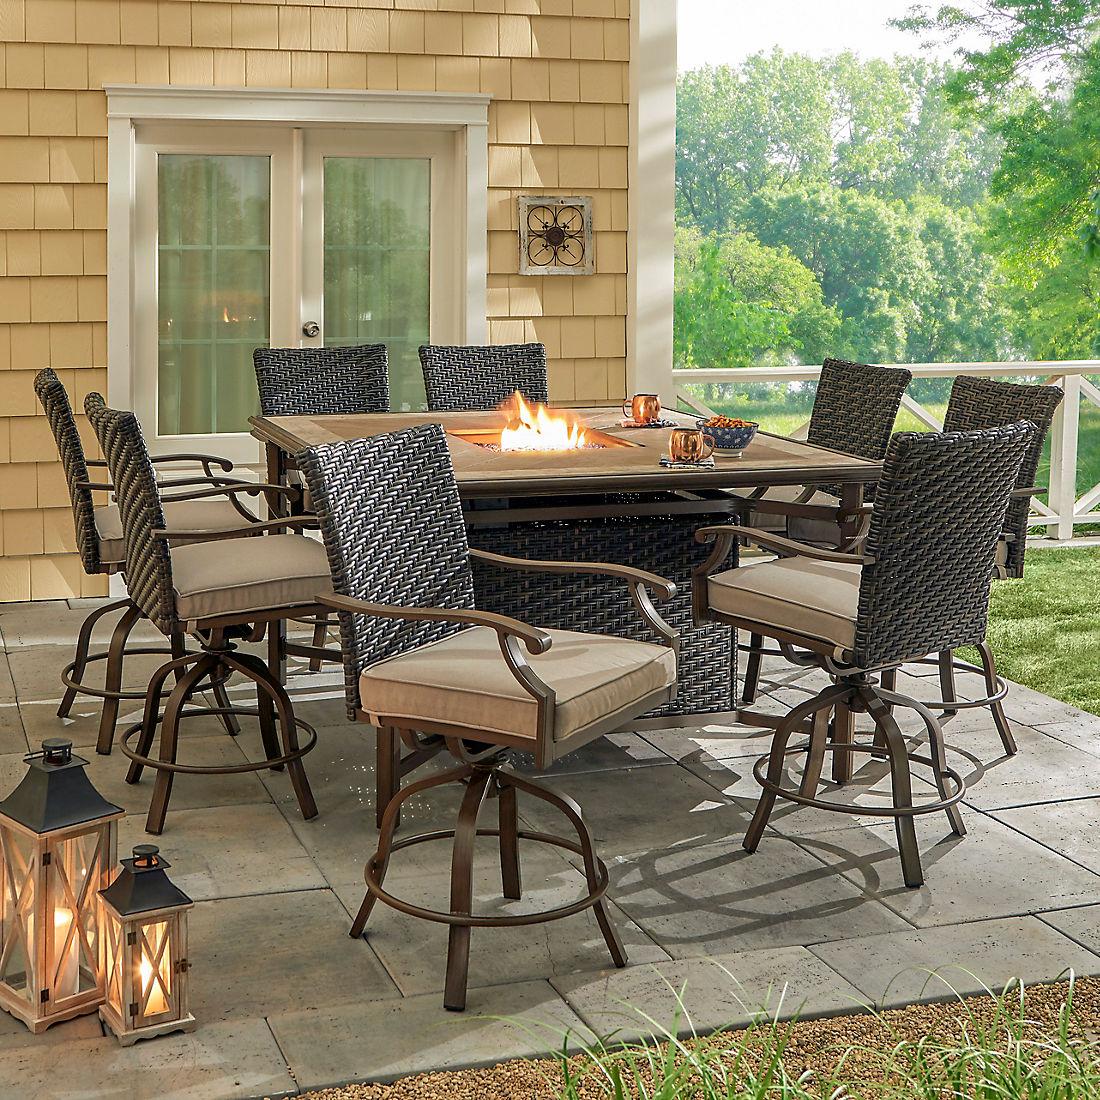 berkley jensen portsmouth 9pc aluminum high dining set with fire swivel chairs